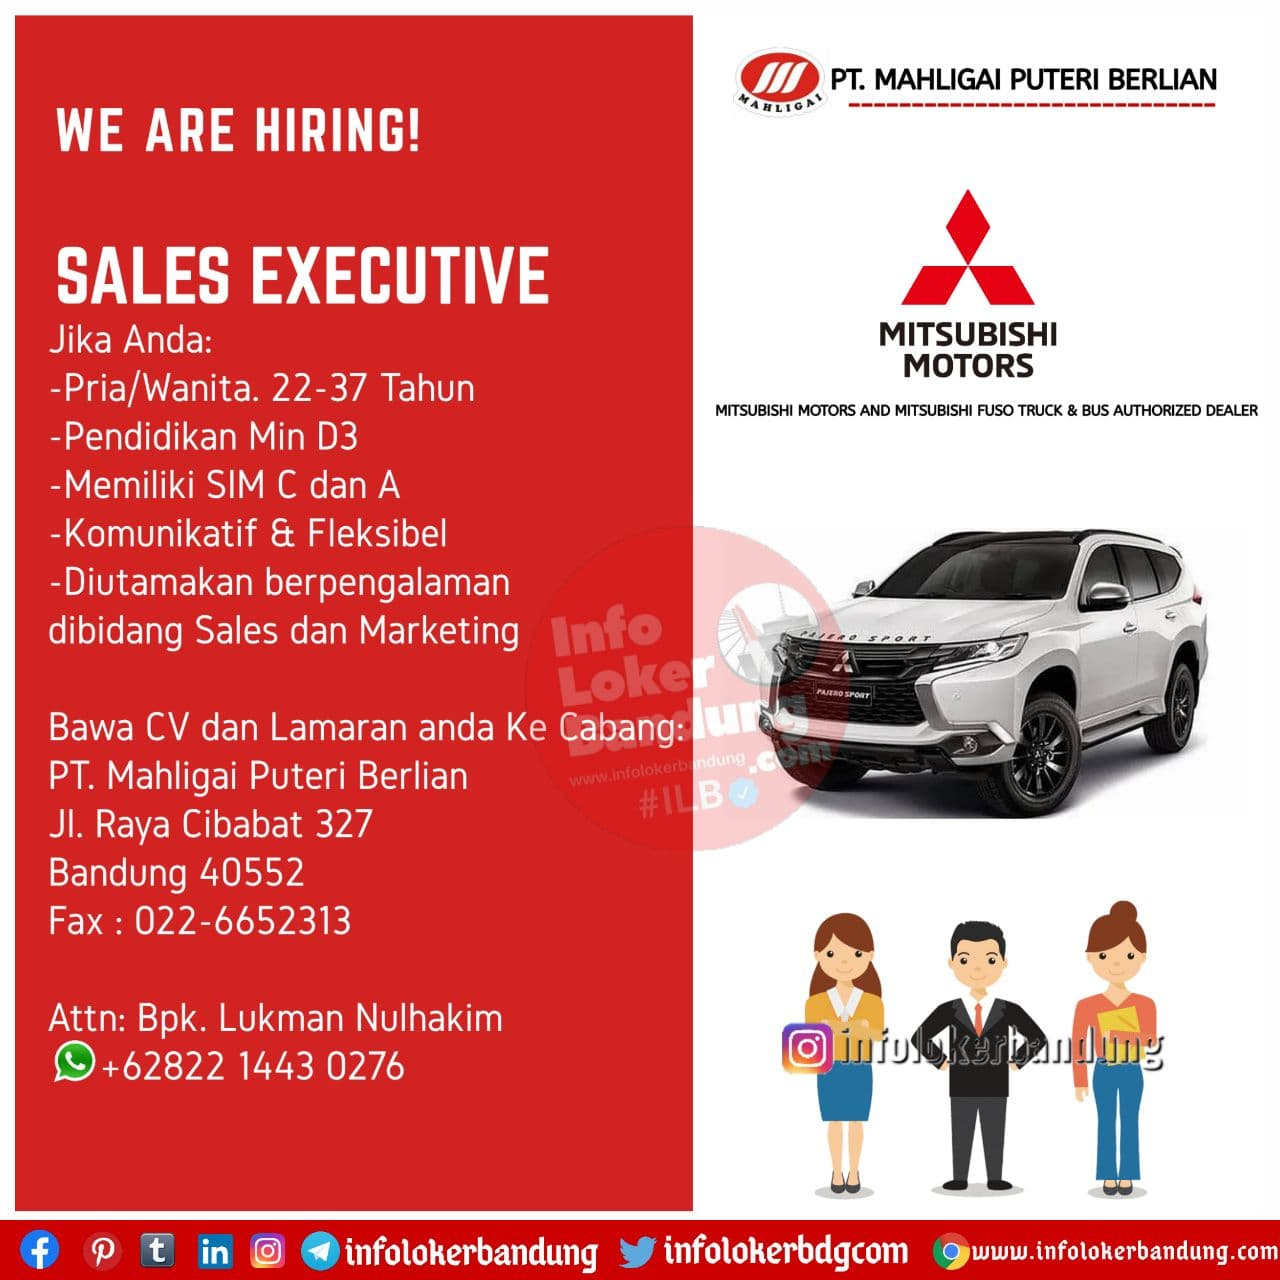 Lowongan Kerja Sales Executive PT. Mahligai Puteri Berlian ( Mitsubishi Motors ) Bandung Desember 2020